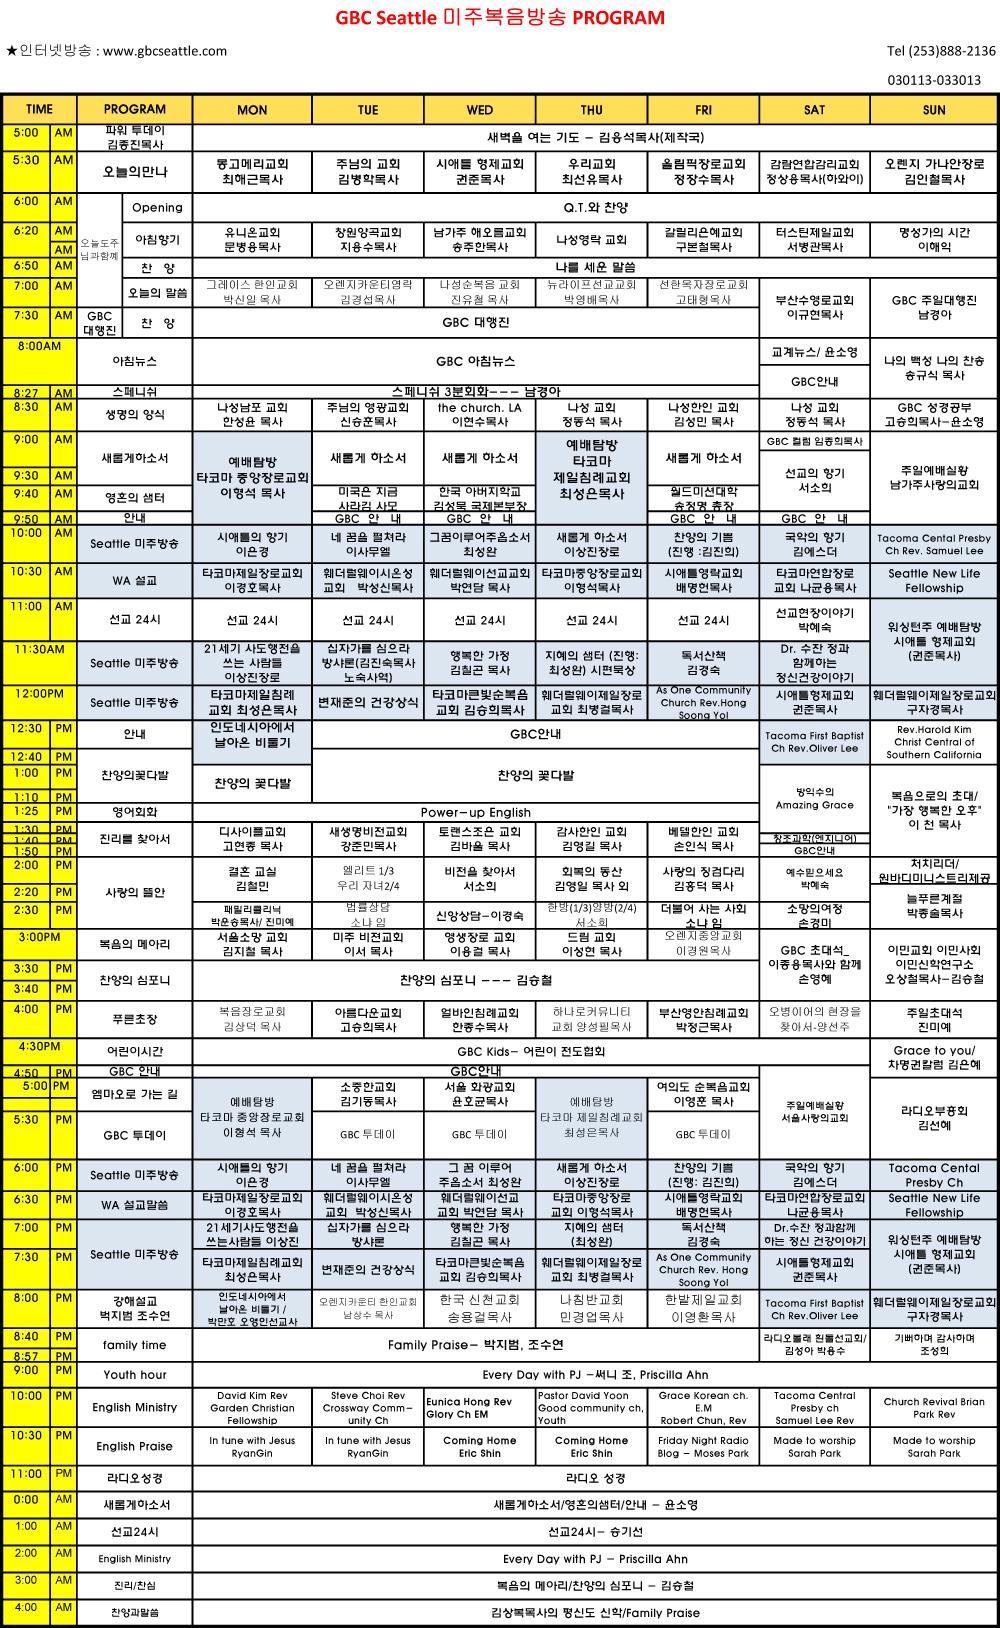 GBC Seattle 프로그램편성표_2013_3월(030113-033013).jpg